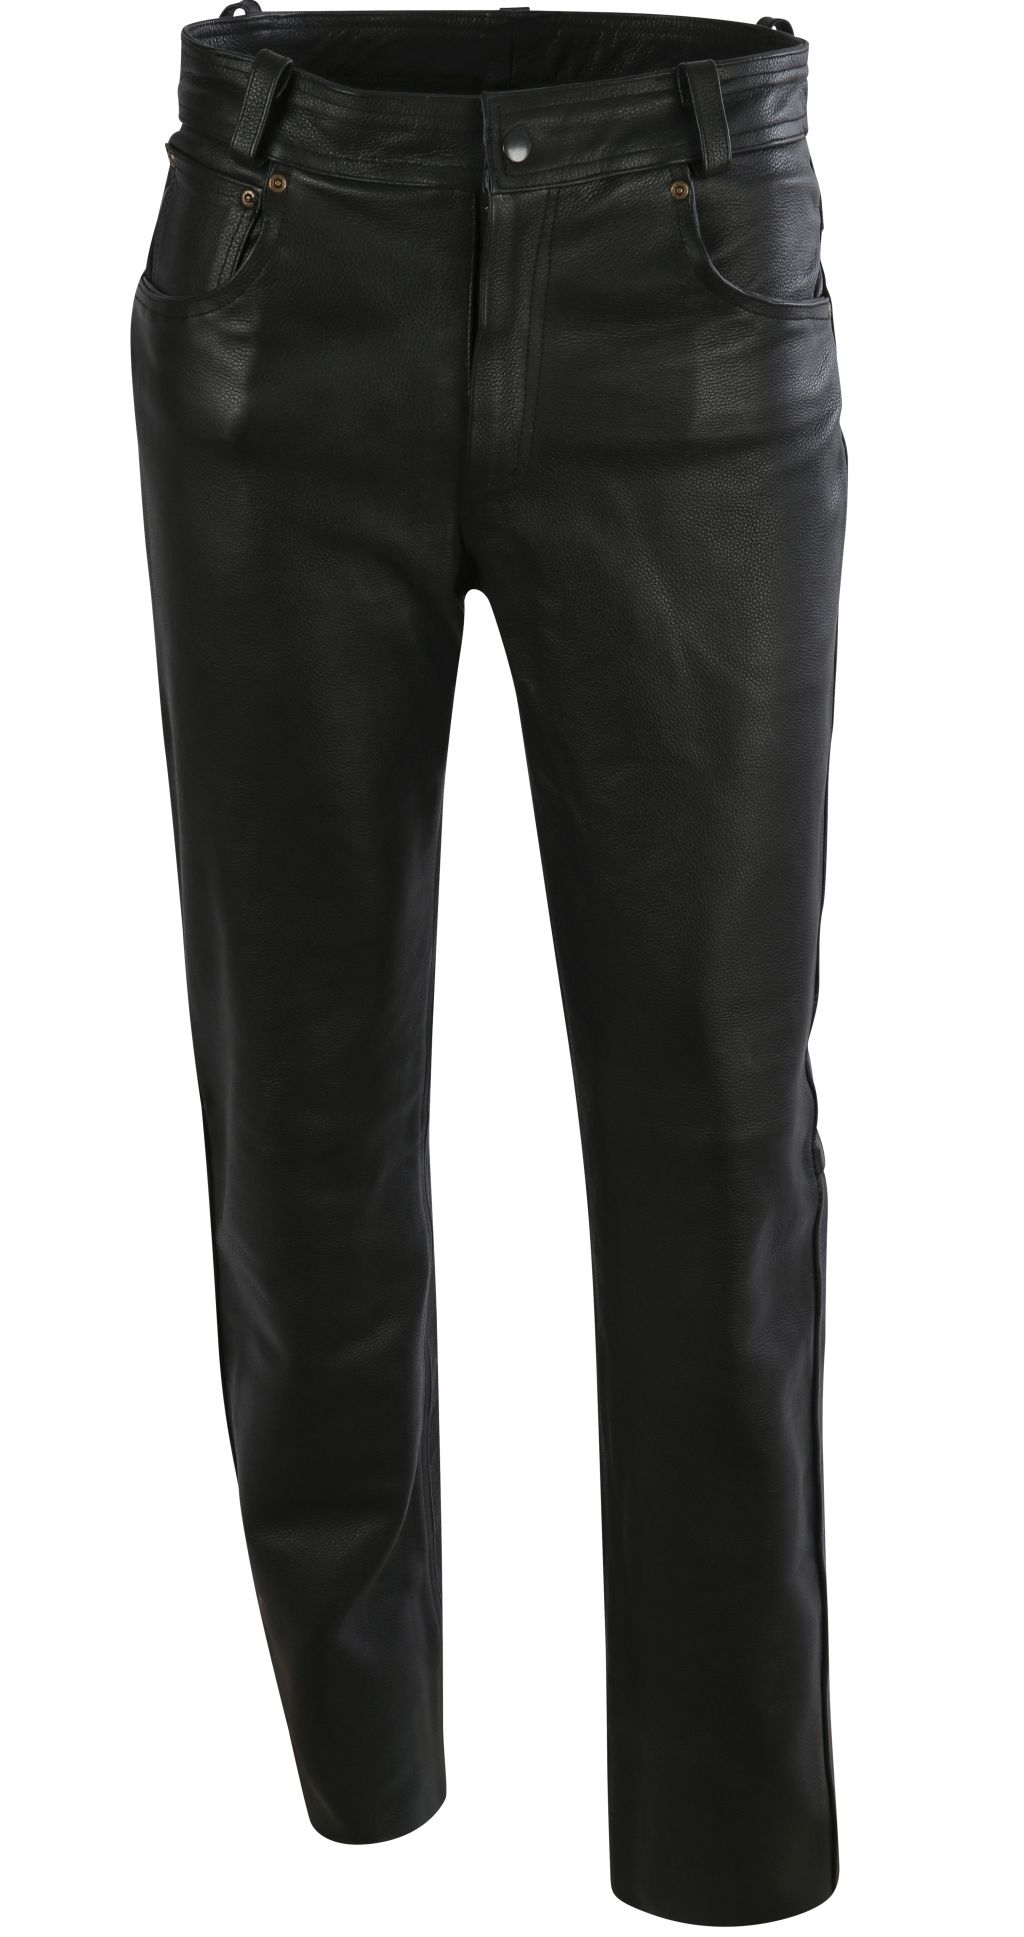 Herren Lederjeans Lederhose Leder Bikerjeans Bangla Schwarz 29 - 34 inch